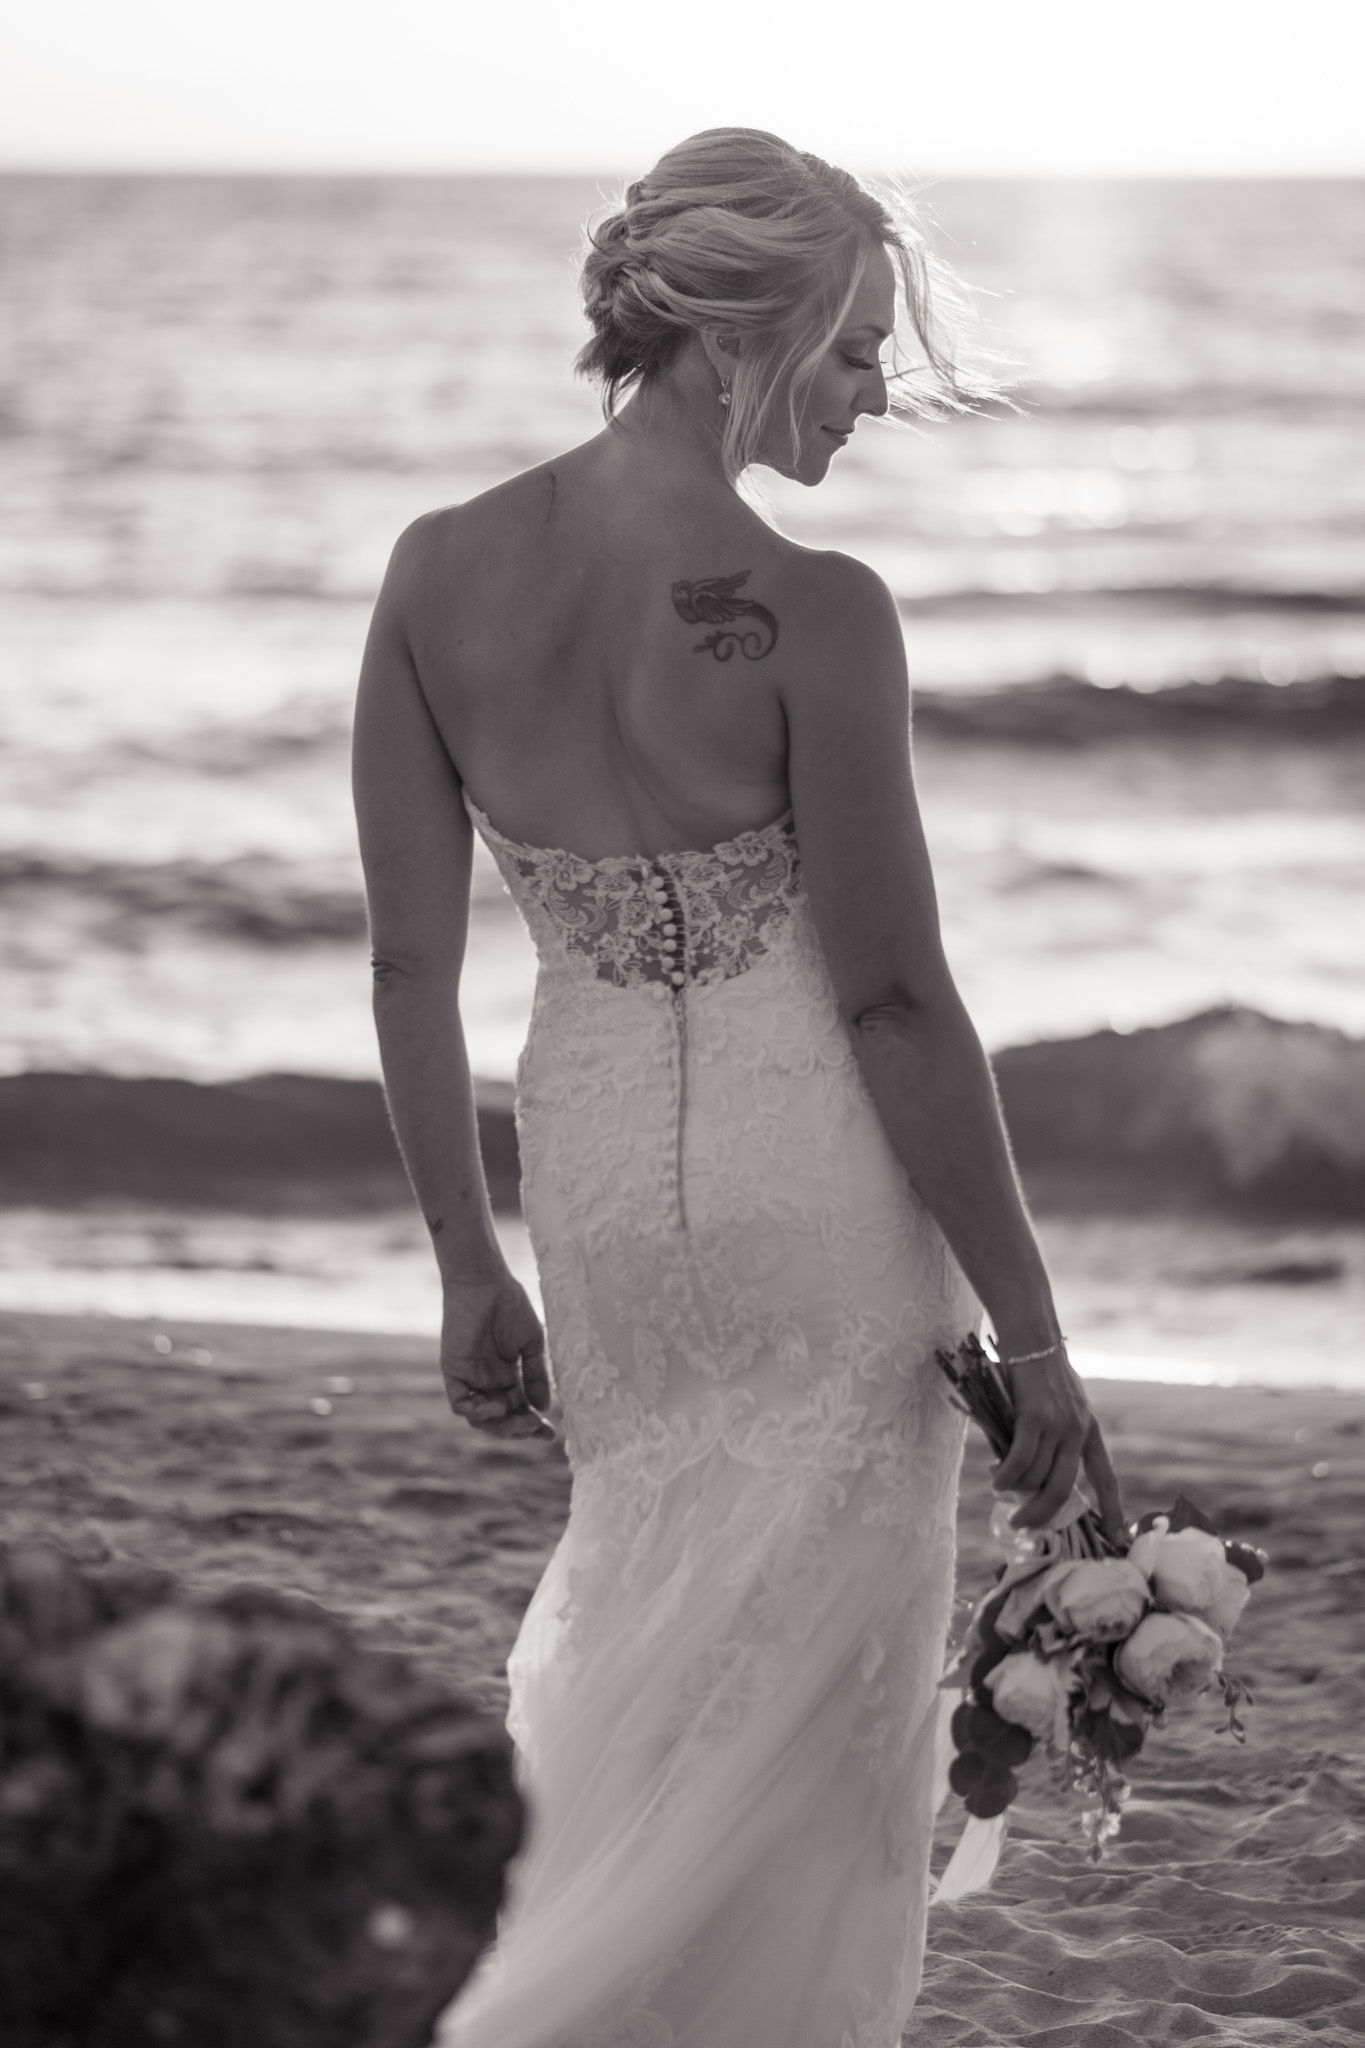 Amber's Bridal Portrait Session | Chicago Wedding Photographer-18.jpg